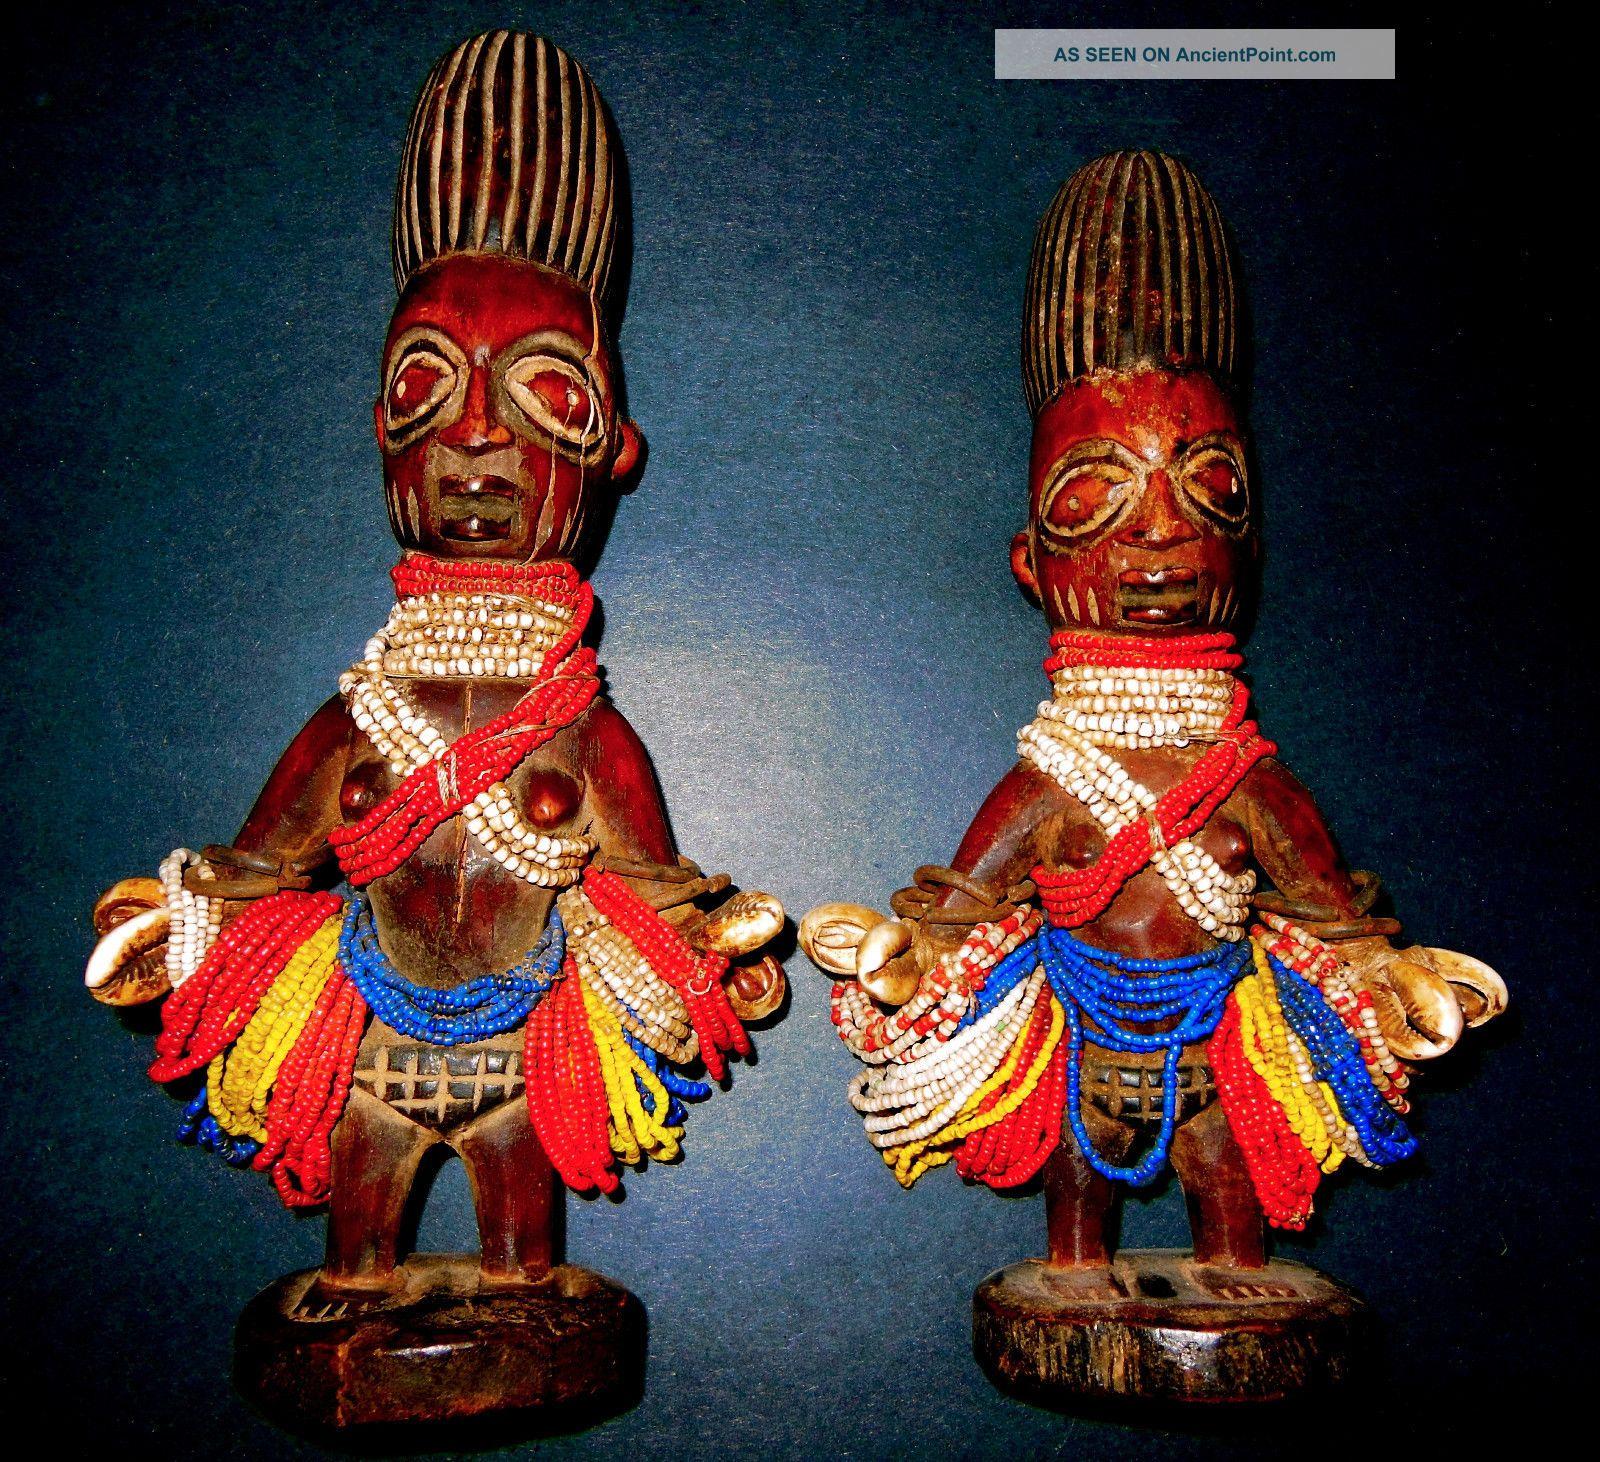 African Tribal Yoruba Ibeji Twin Pair Ethnographic Art,  Decor,  Sculpture Nigeria Sculptures & Statues photo